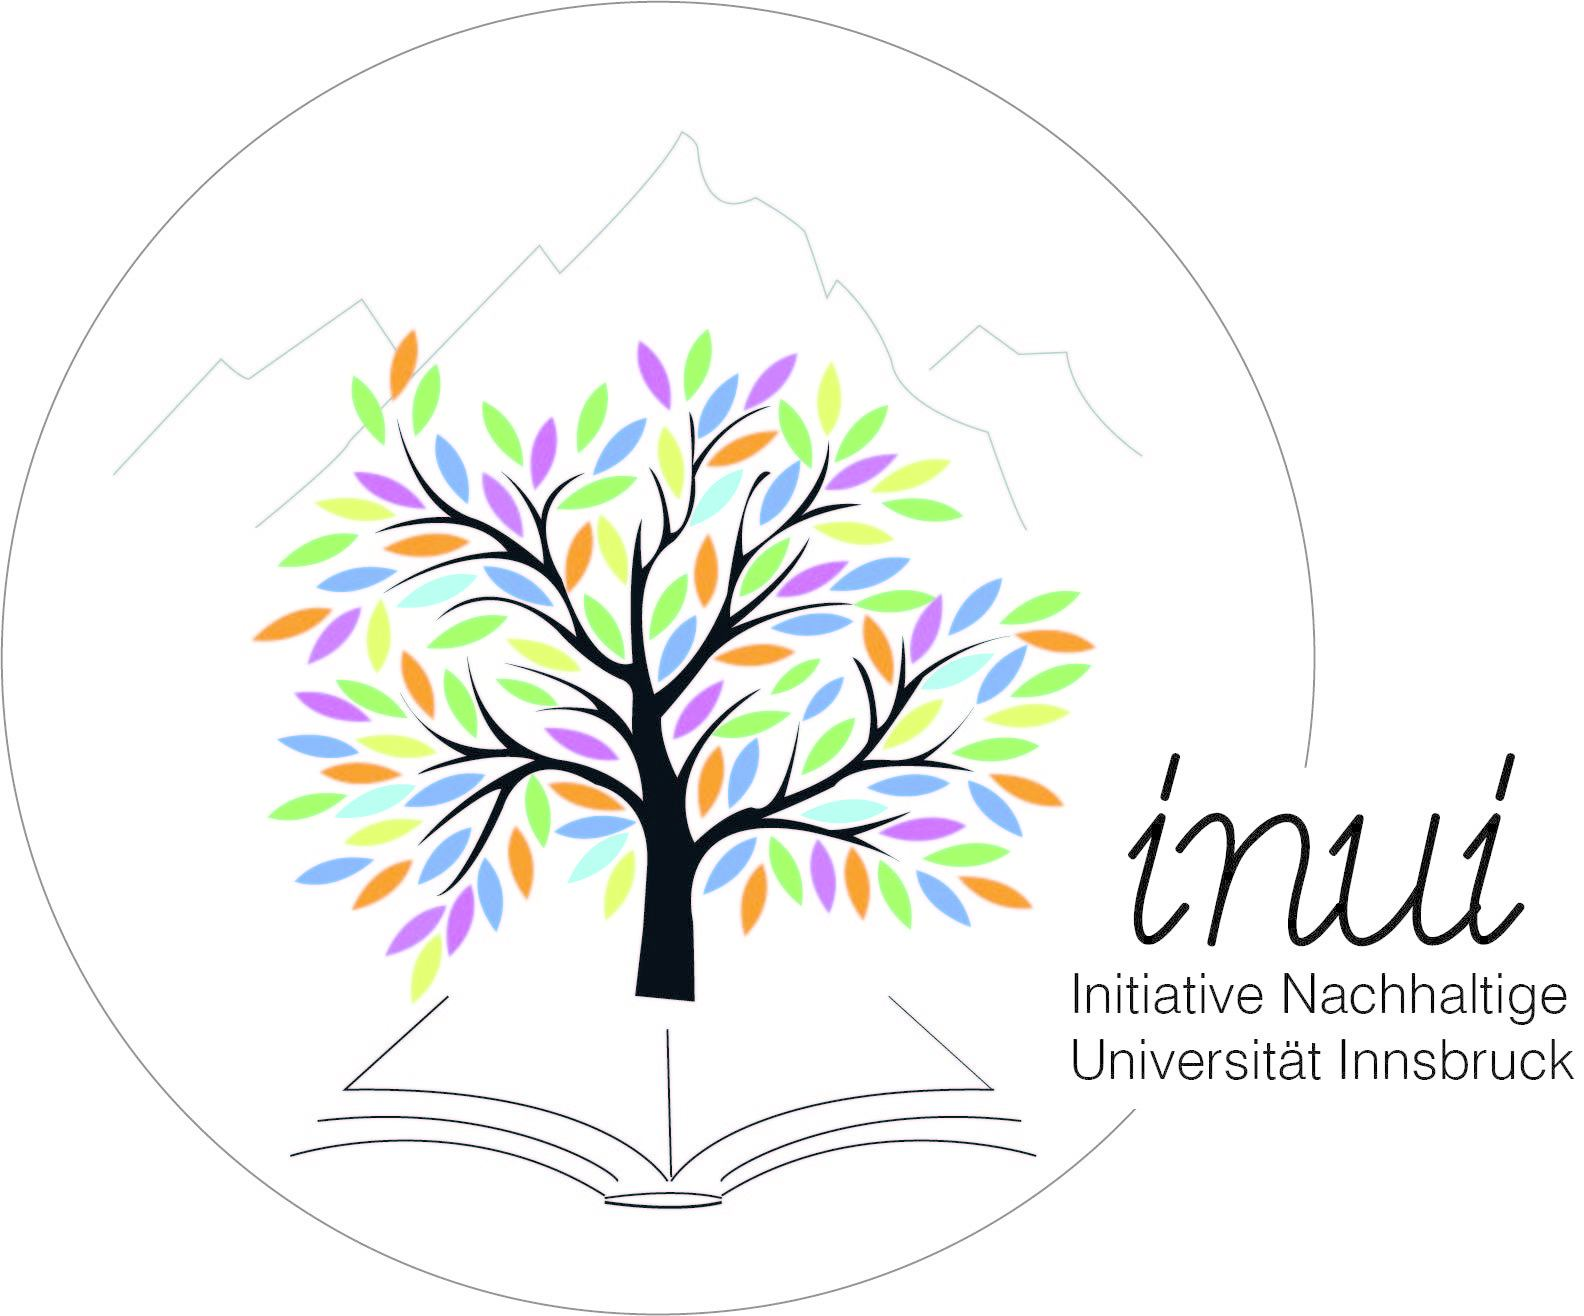 Logo: INUI - Initiative Nachhaltige Universität Innsbruck